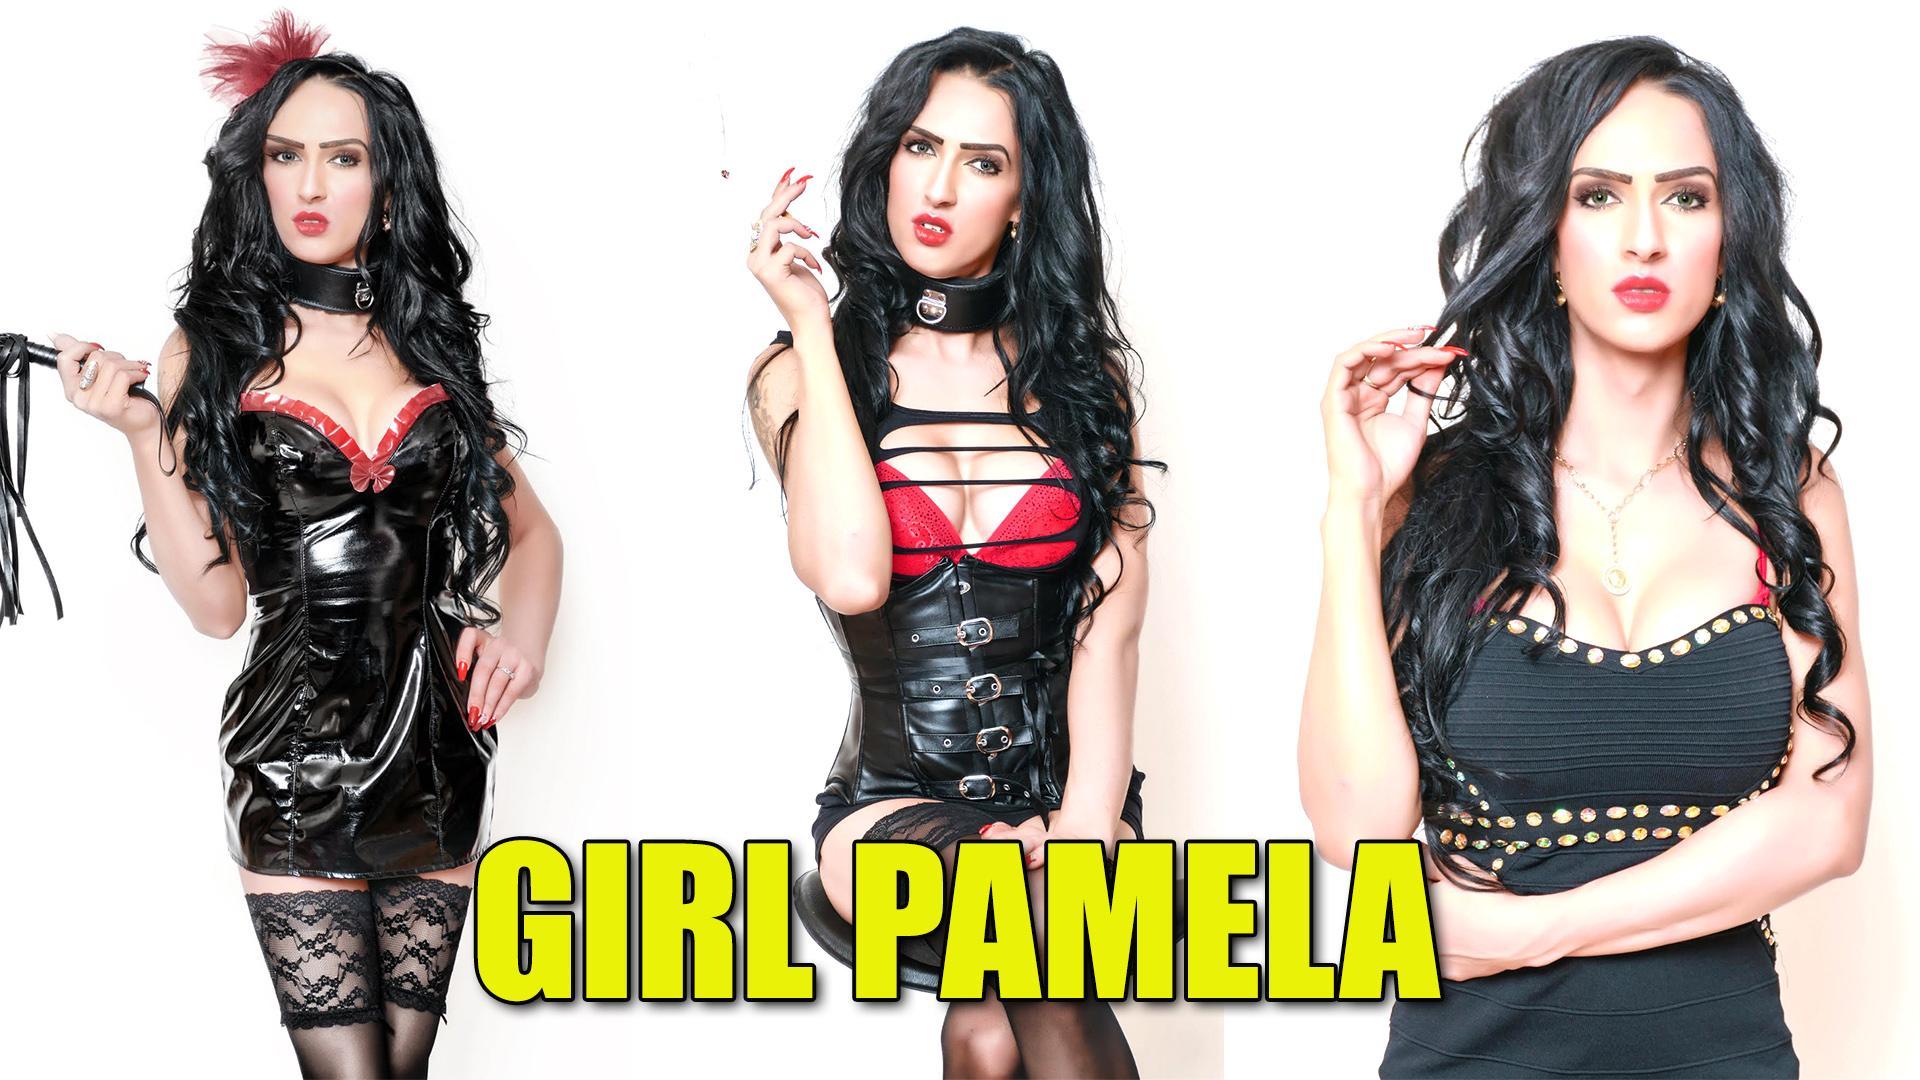 Girl Pamela Shemale in Berlin